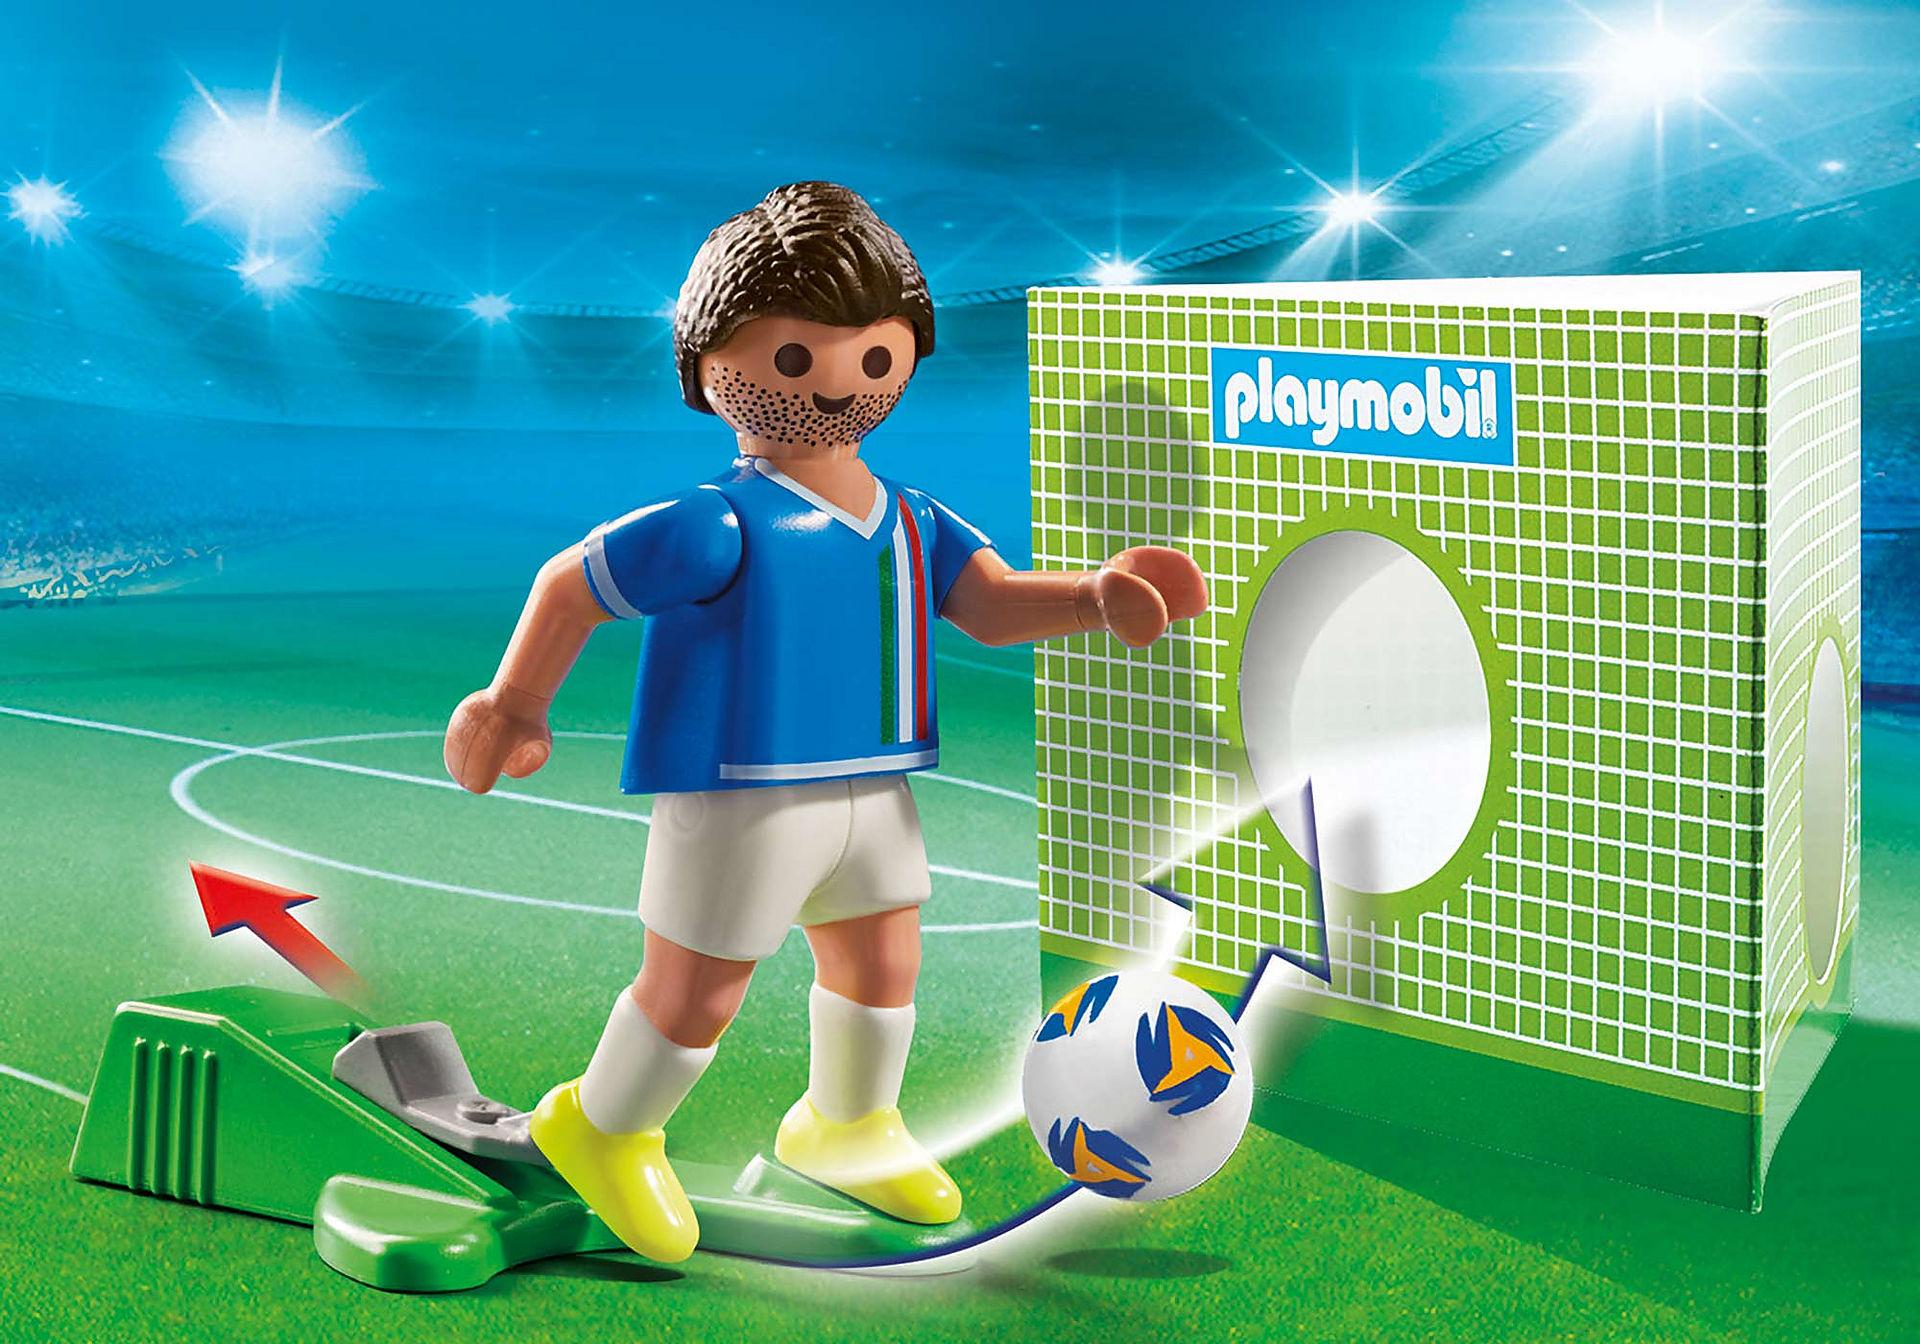 70485 Italiensk fotbollsspelare zoom image1